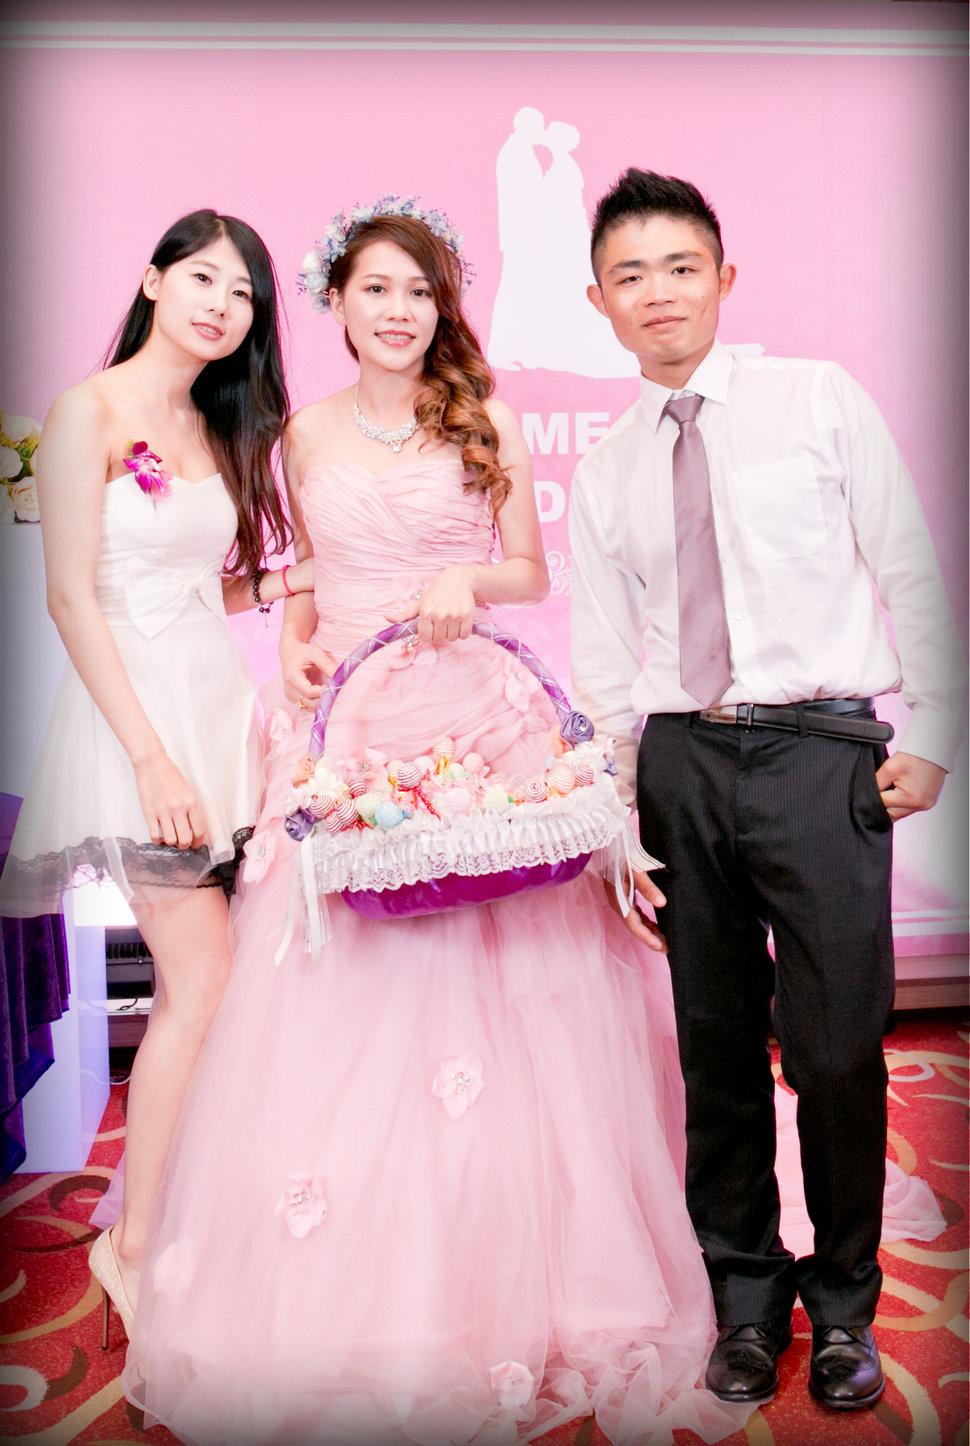 YF2A1468 - Yusin 攝影~與您同心祝福您永結同心 - 結婚吧